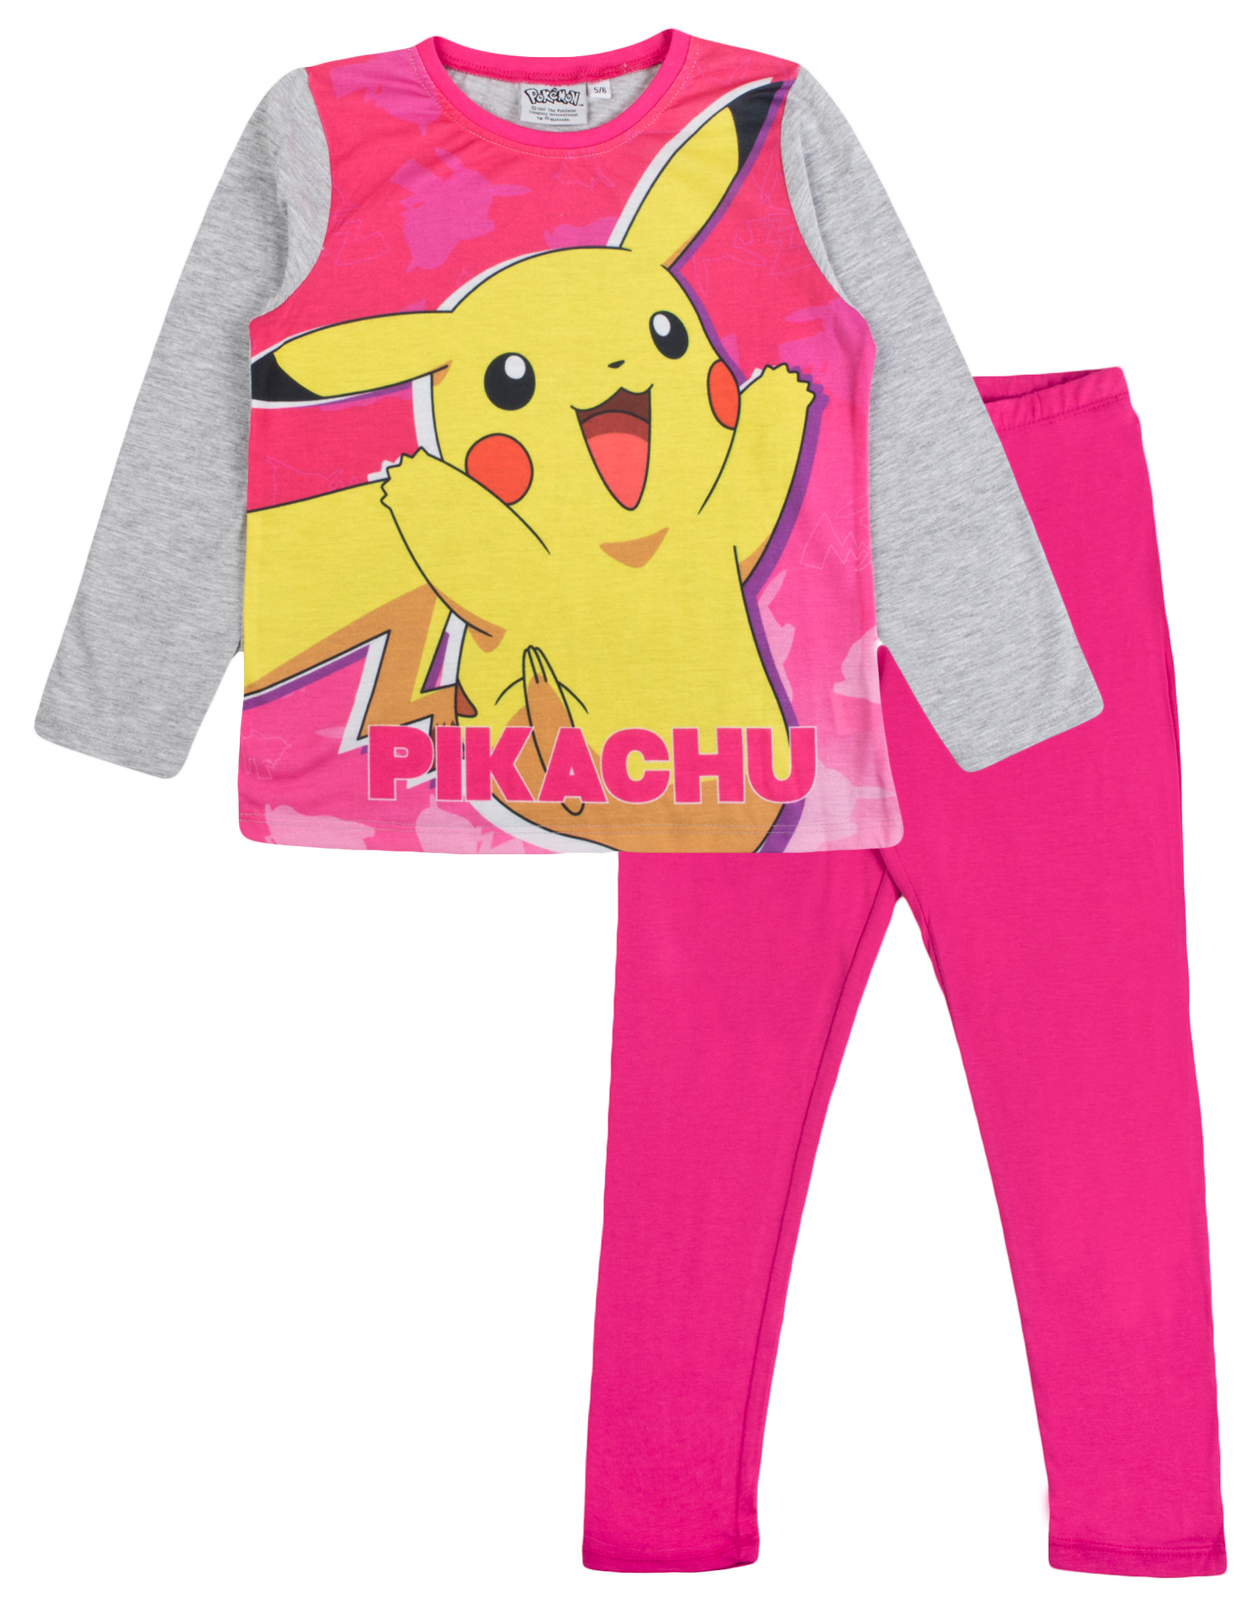 Girls Pokemon Long Pyjamas Kids Pikachu 2 Piece Pjs Nightwear Set Pink Size